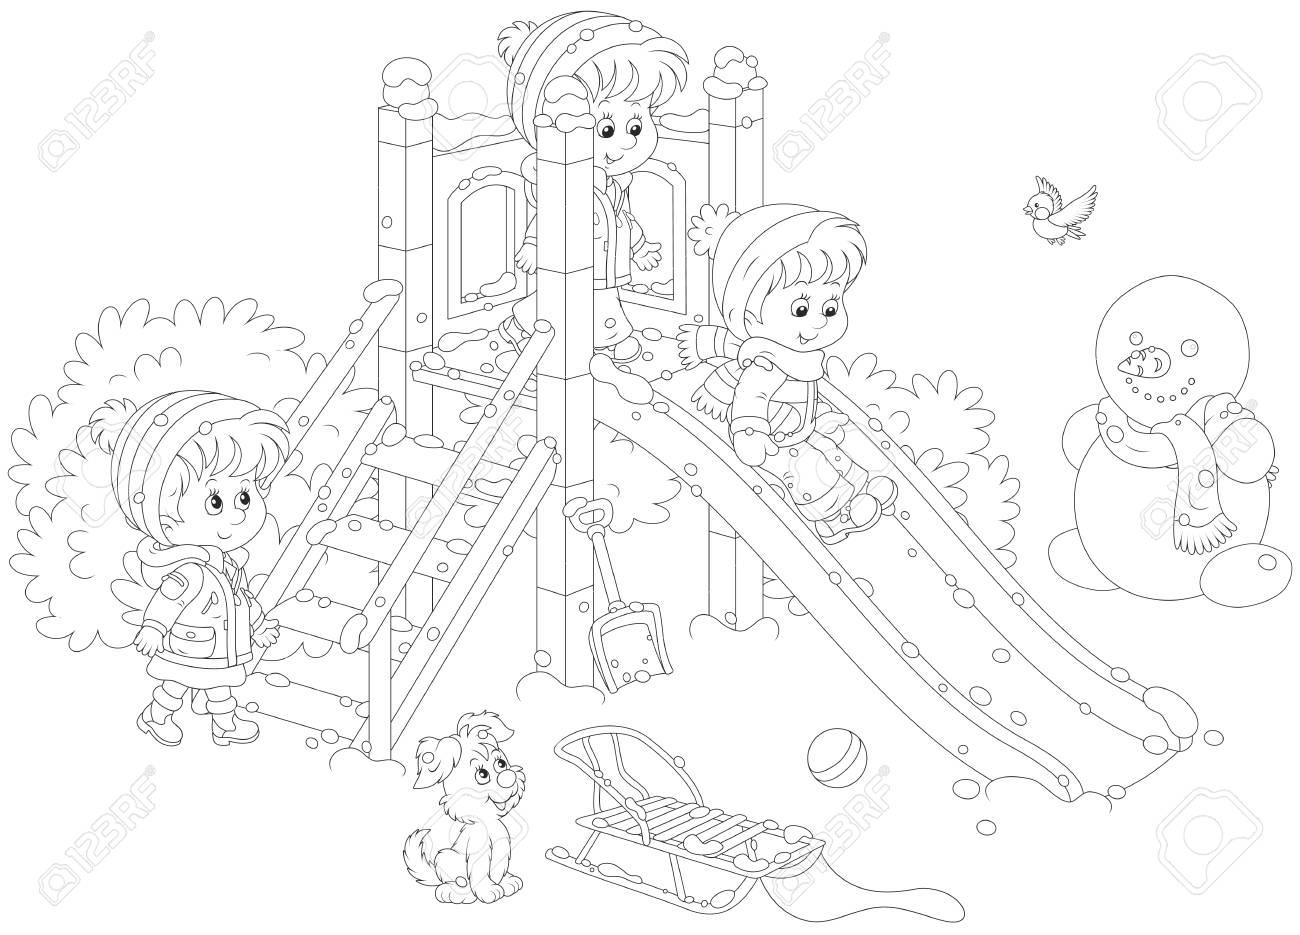 Playground Slide Drawing At Getdrawings